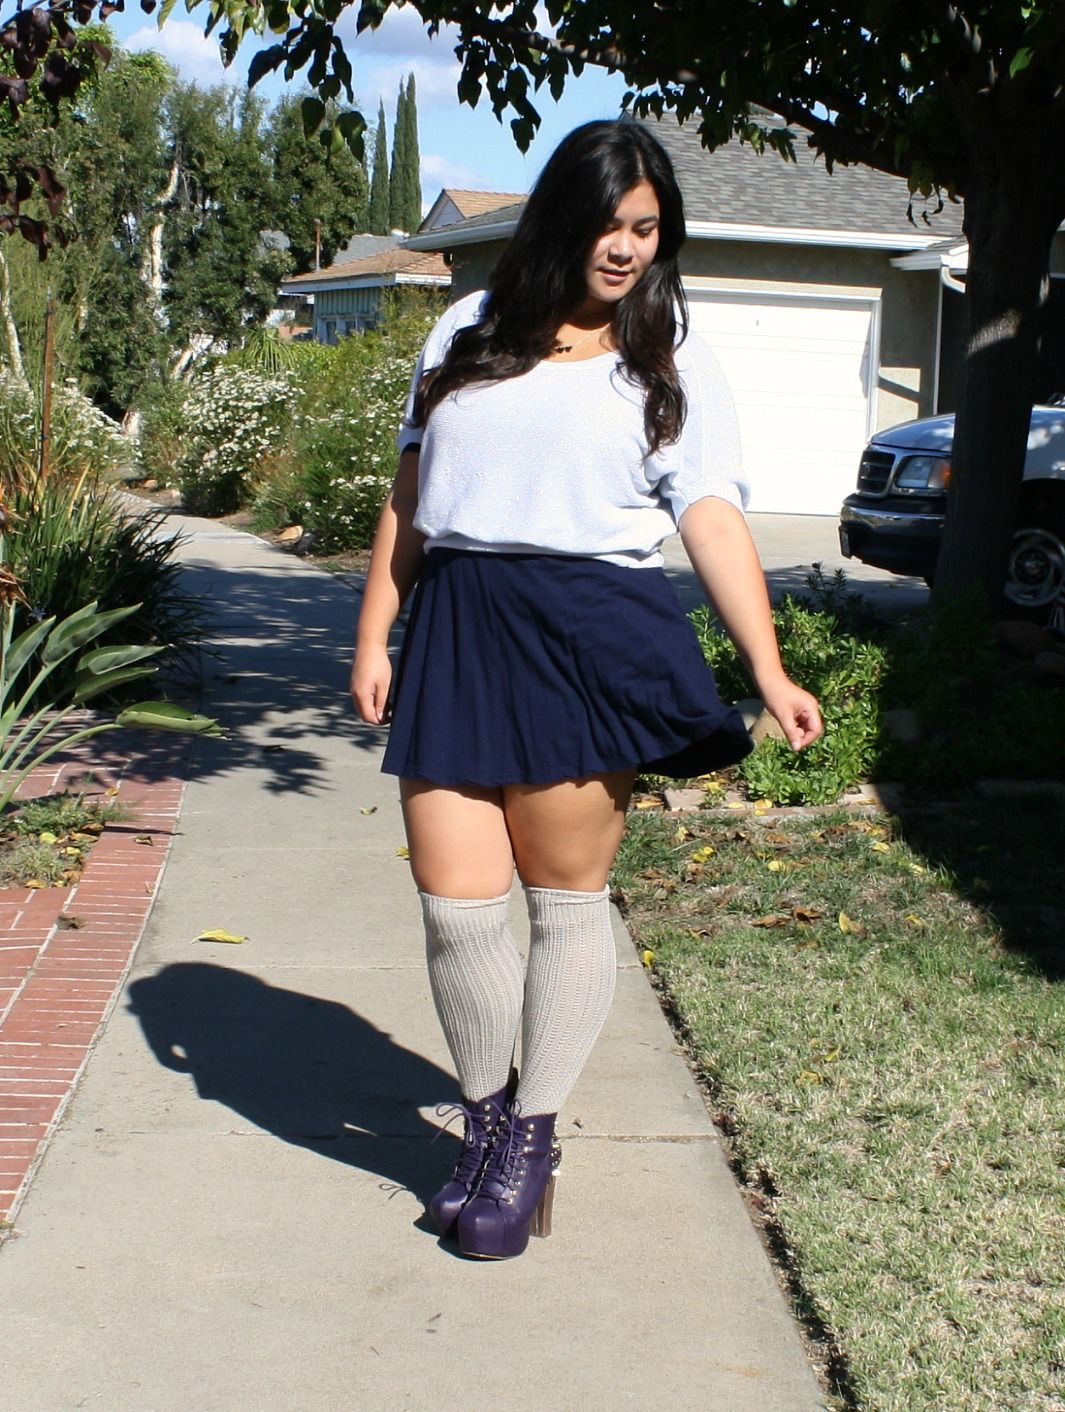 e9ef2cdc997 Dresses and Thigh-high socks for Winter . Curvy girls fashion